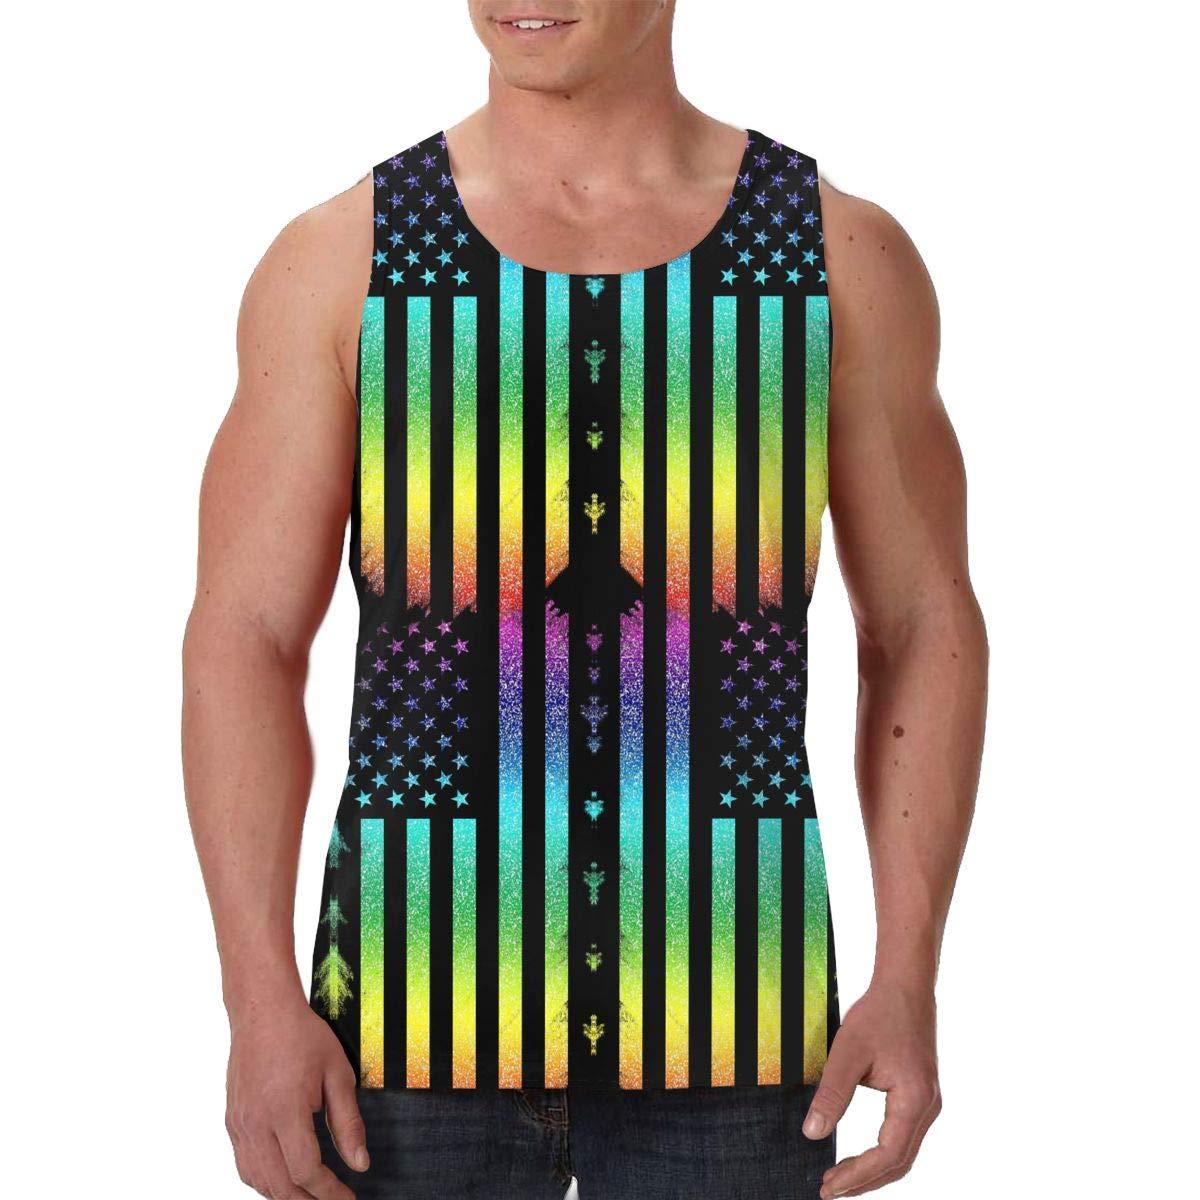 Antonia Bellamy Colourful American Flag Gay Pride Mens All-Over Print Tank Top Slim Fit Muscle Shirt